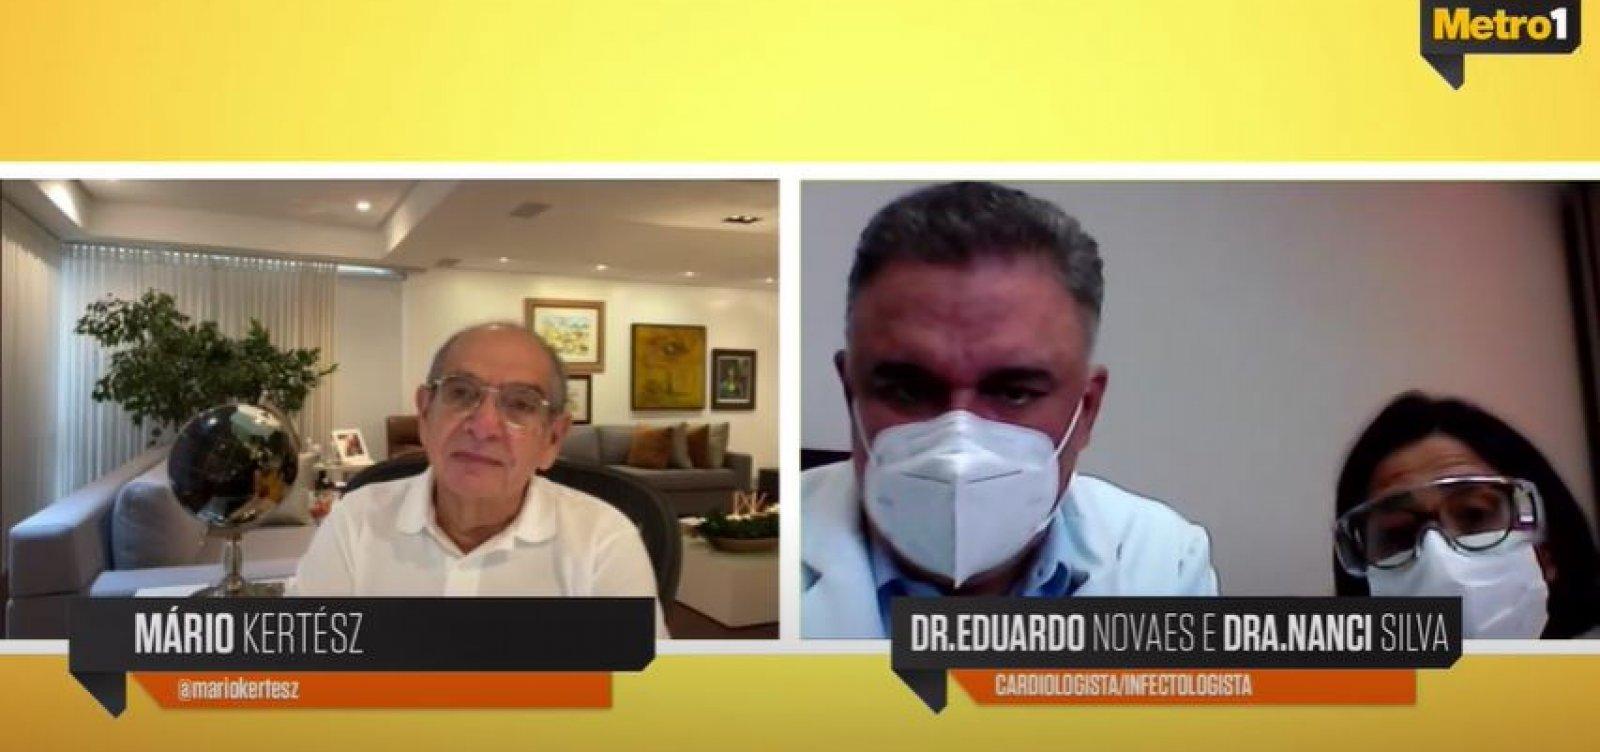 Médicos refutam tratamento precoce contra o coronavírus: 'Kit Covid é kit ilusão'